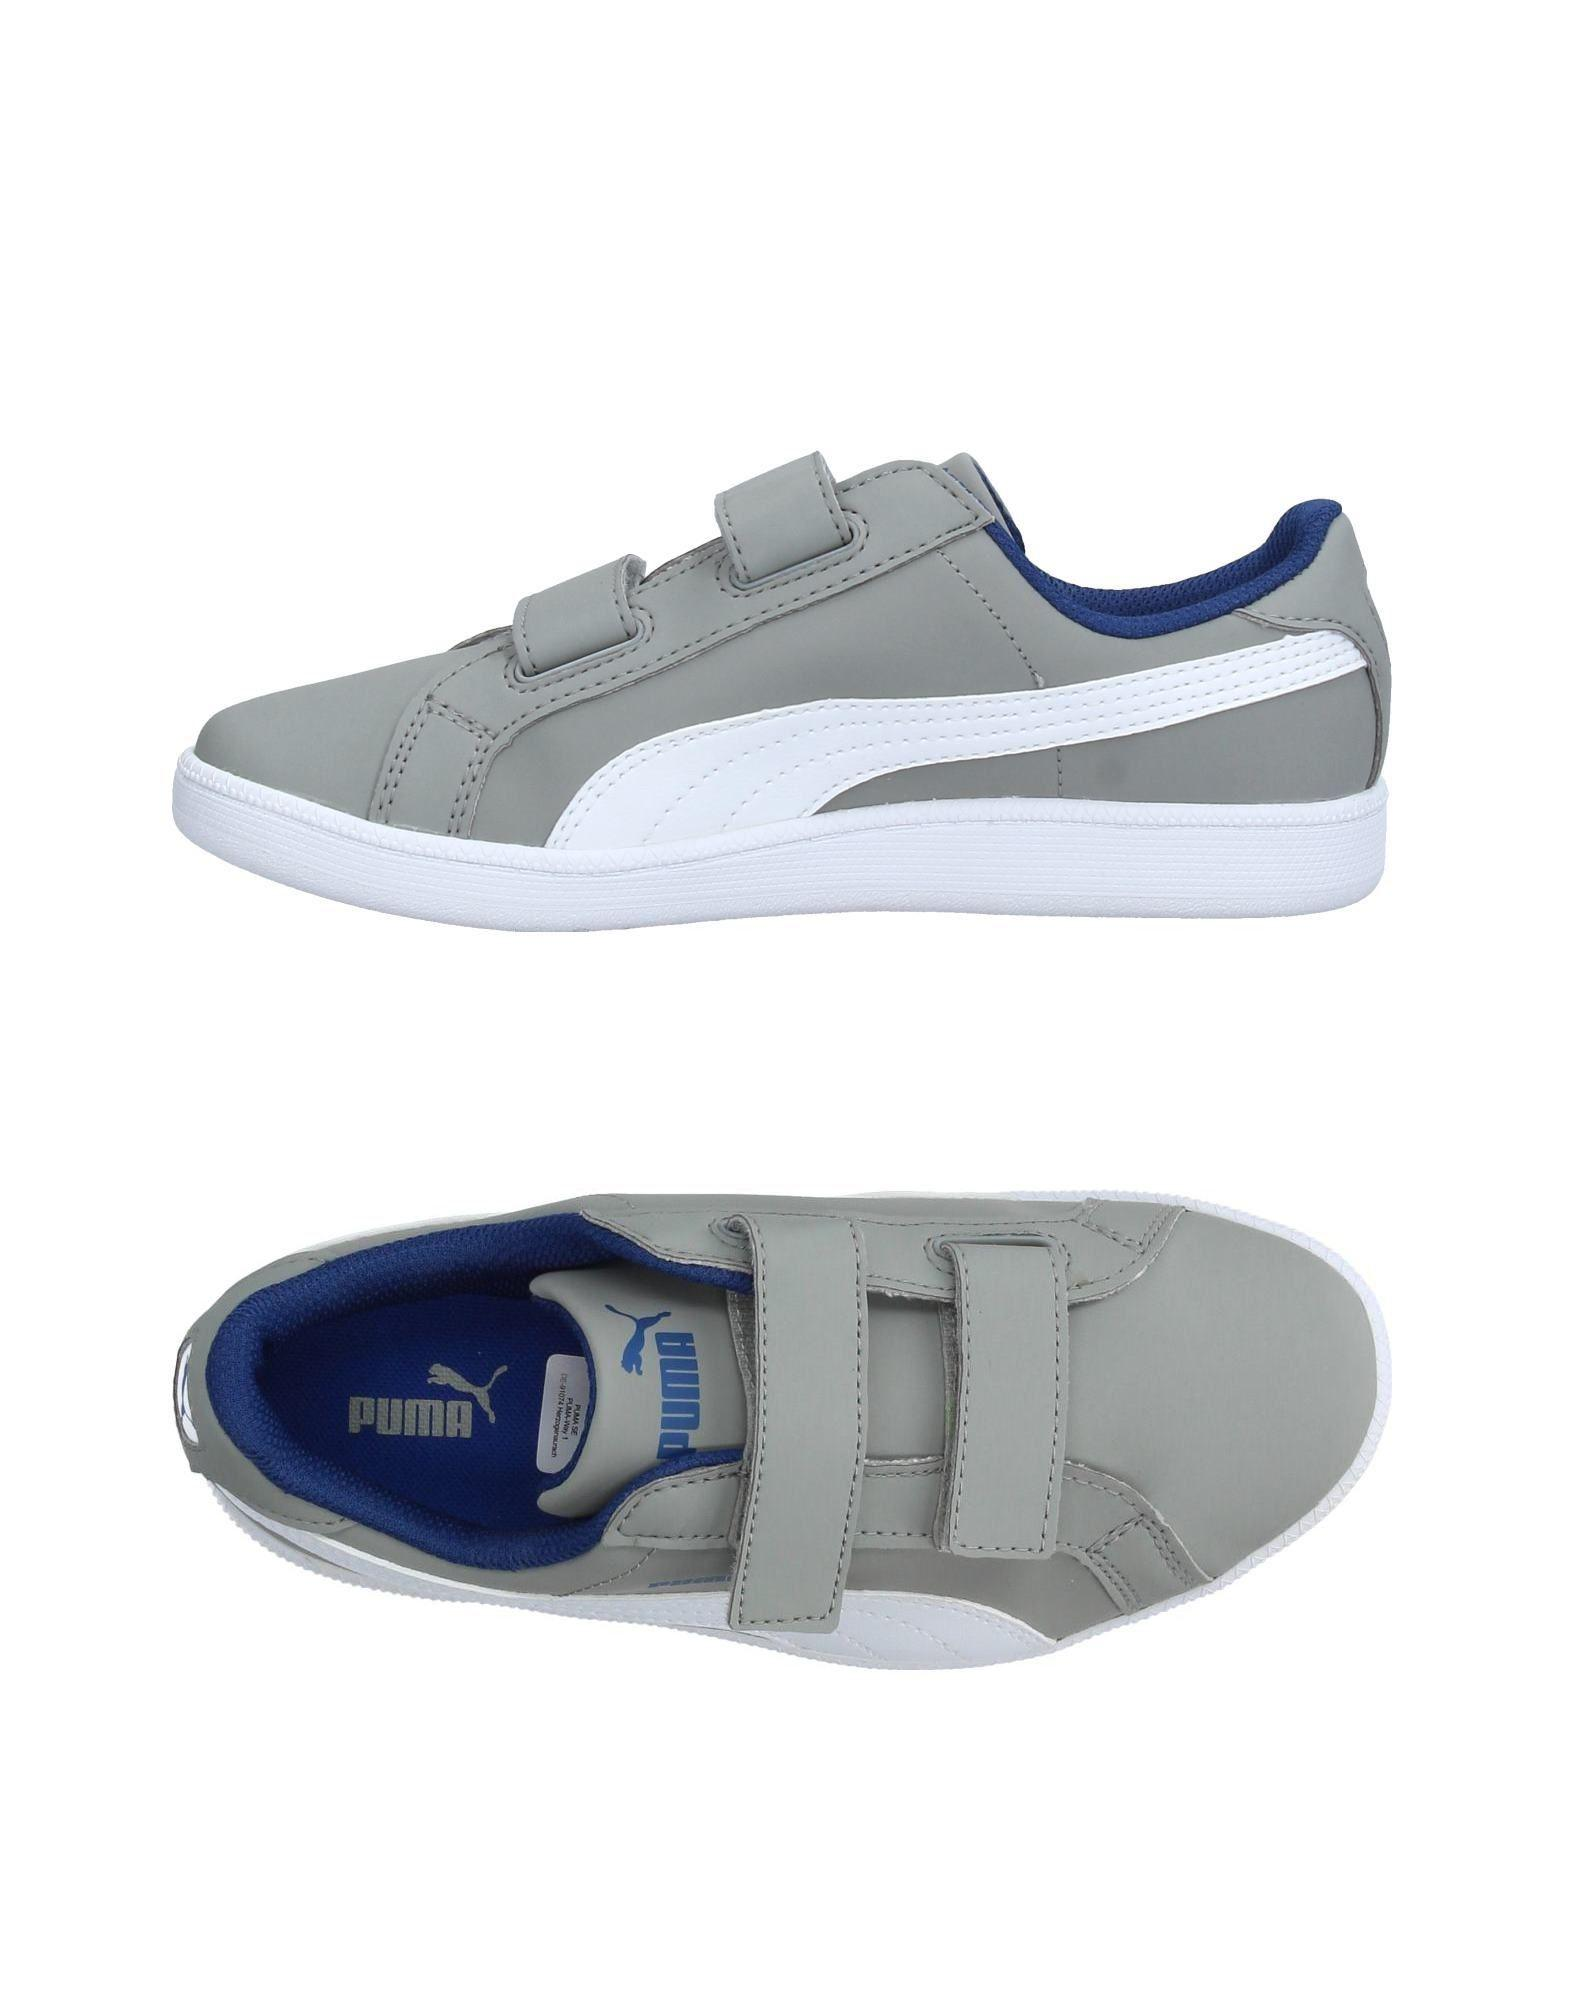 Lyst puma low tops sneakers in gray jpg 1571x2000 Puma low tops 62c37d5e4d